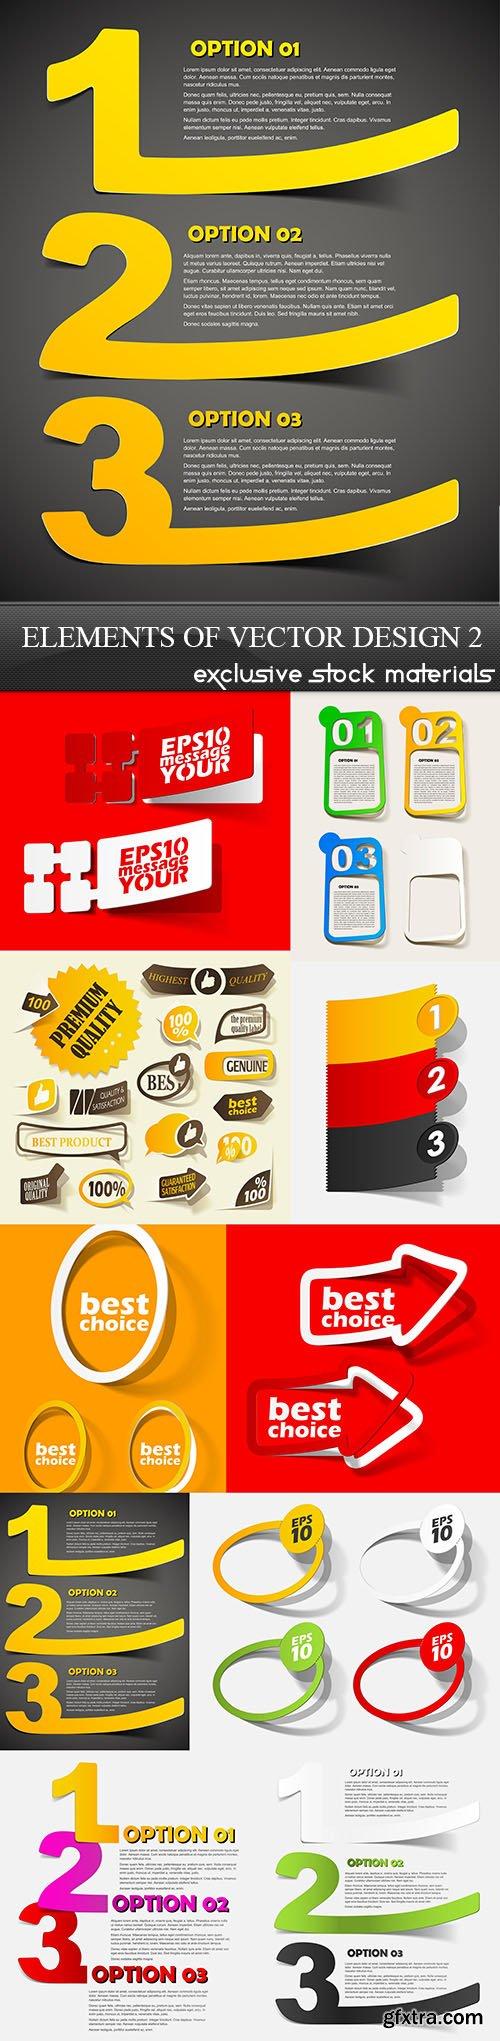 Elements of Vector Design 2, 10xEPS